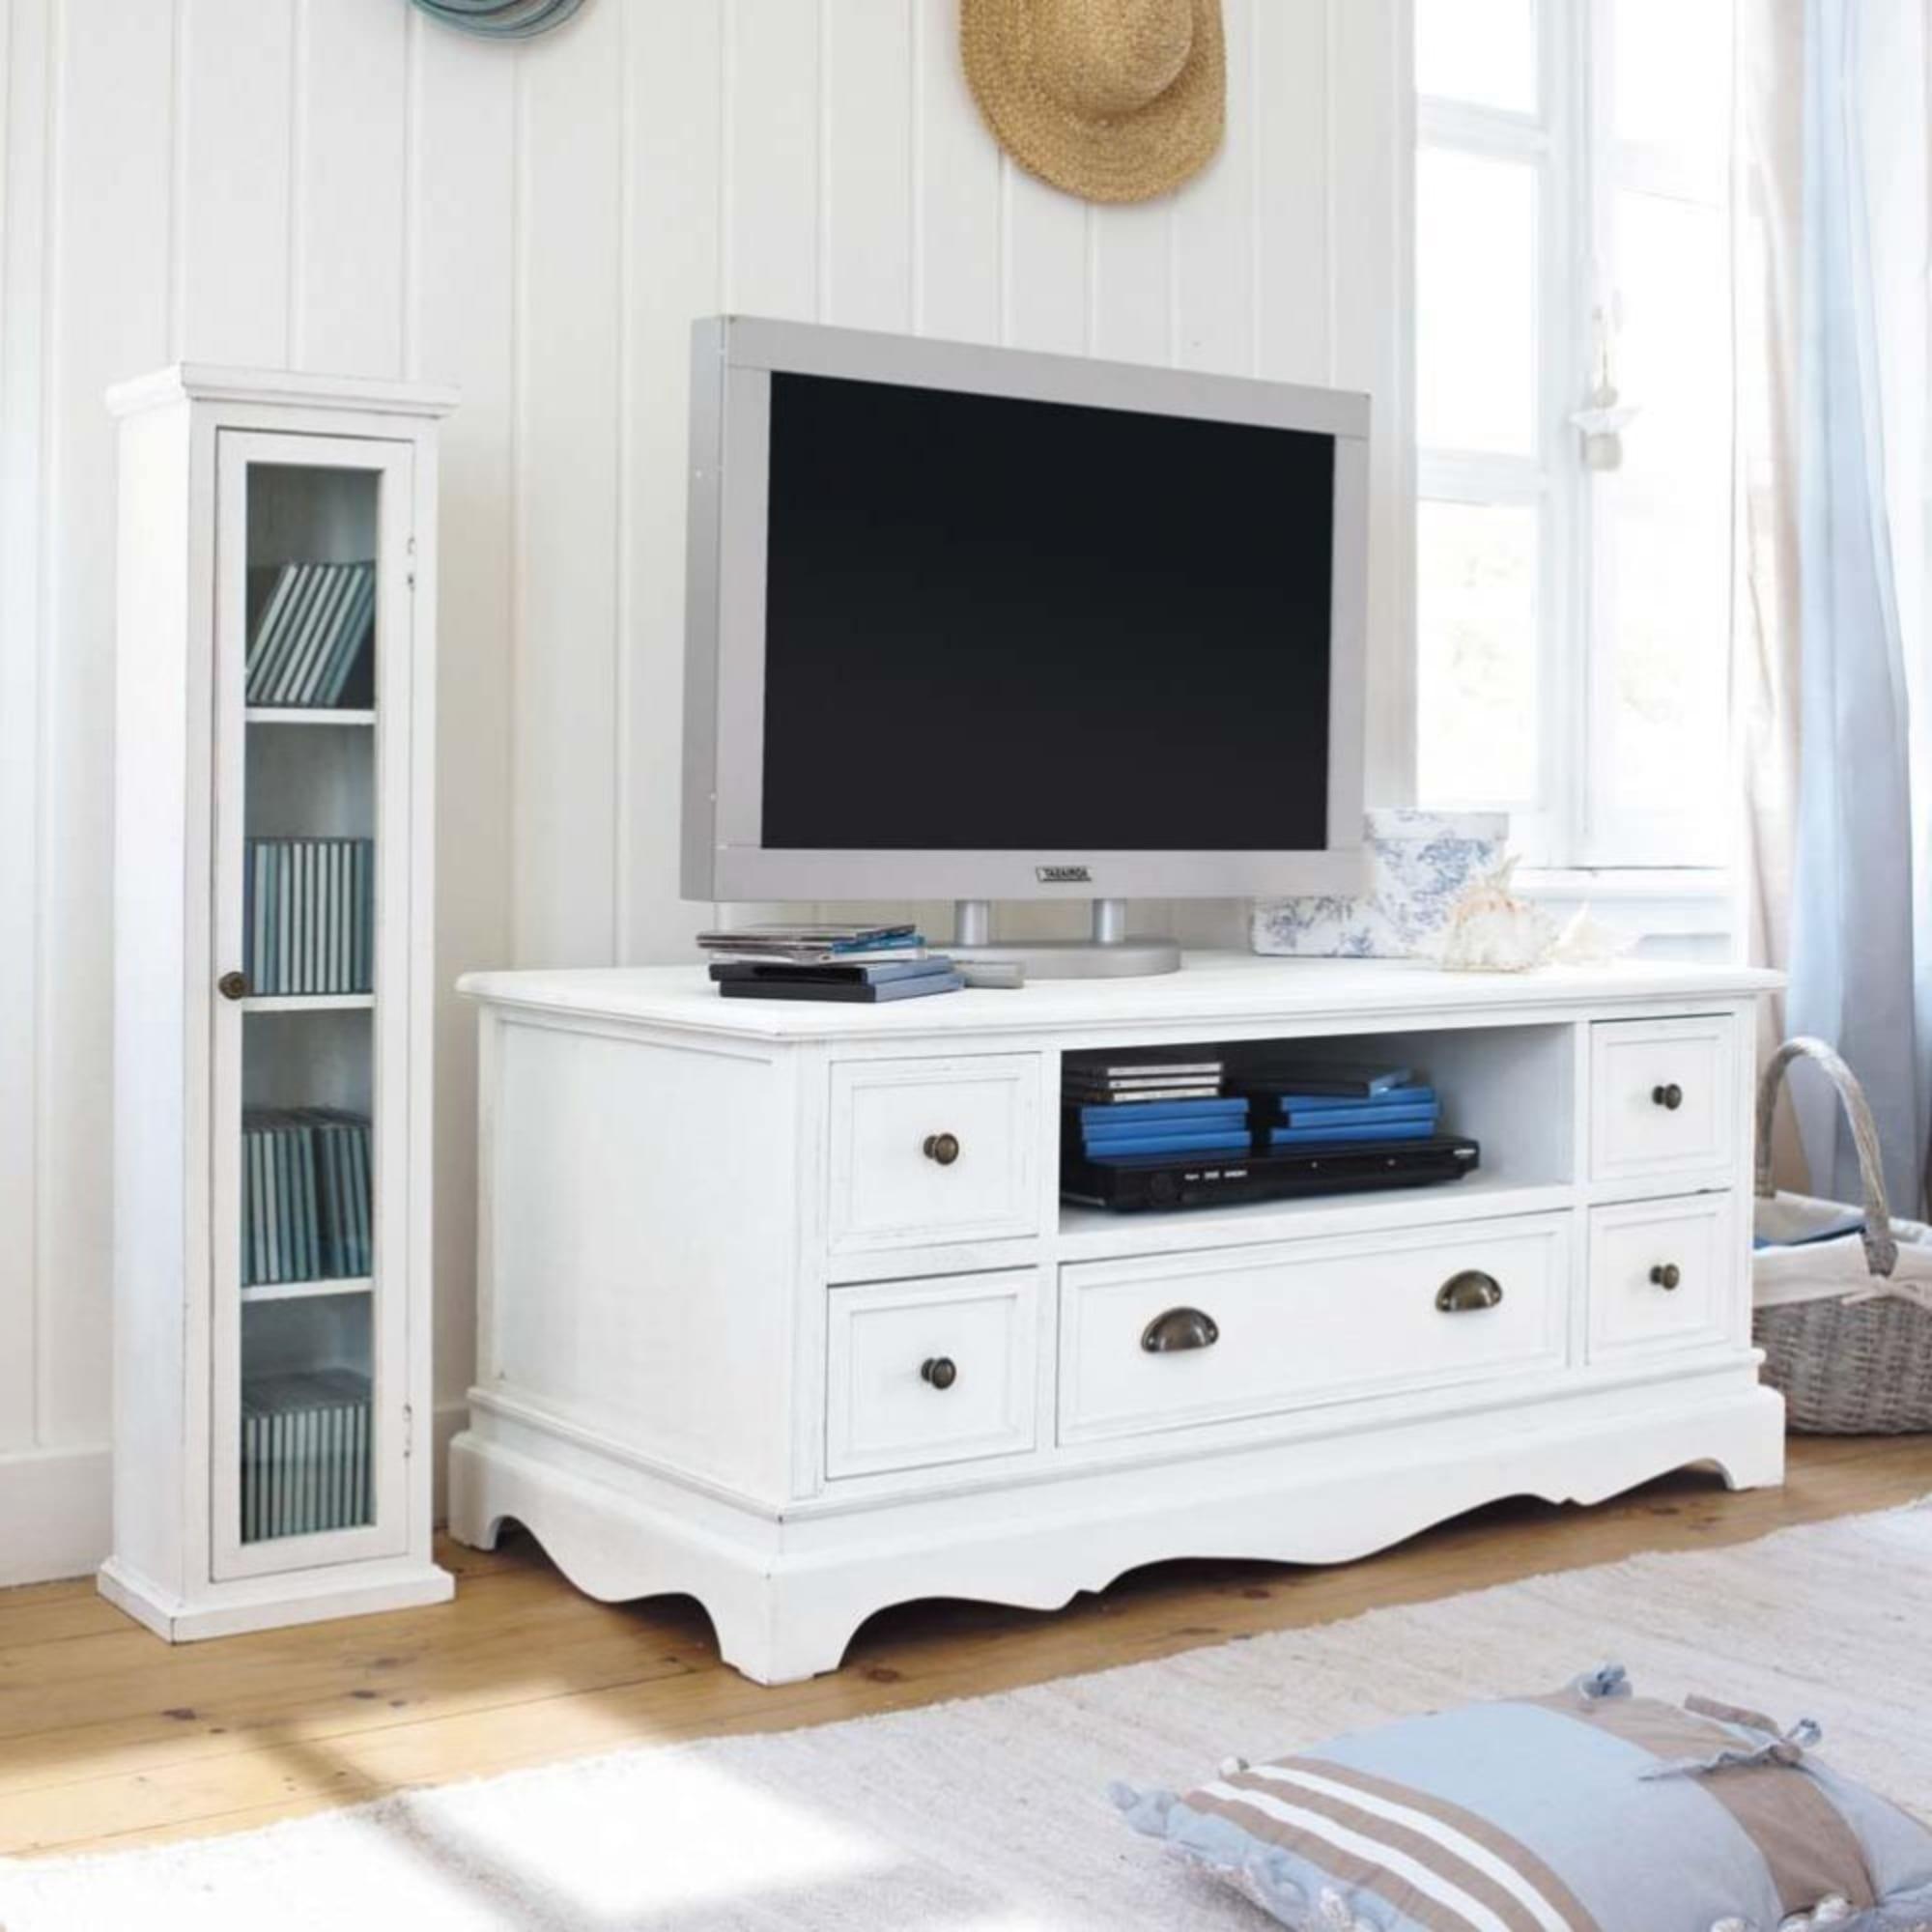 Meuble De Tv Blanc à Moins De 300 Euros